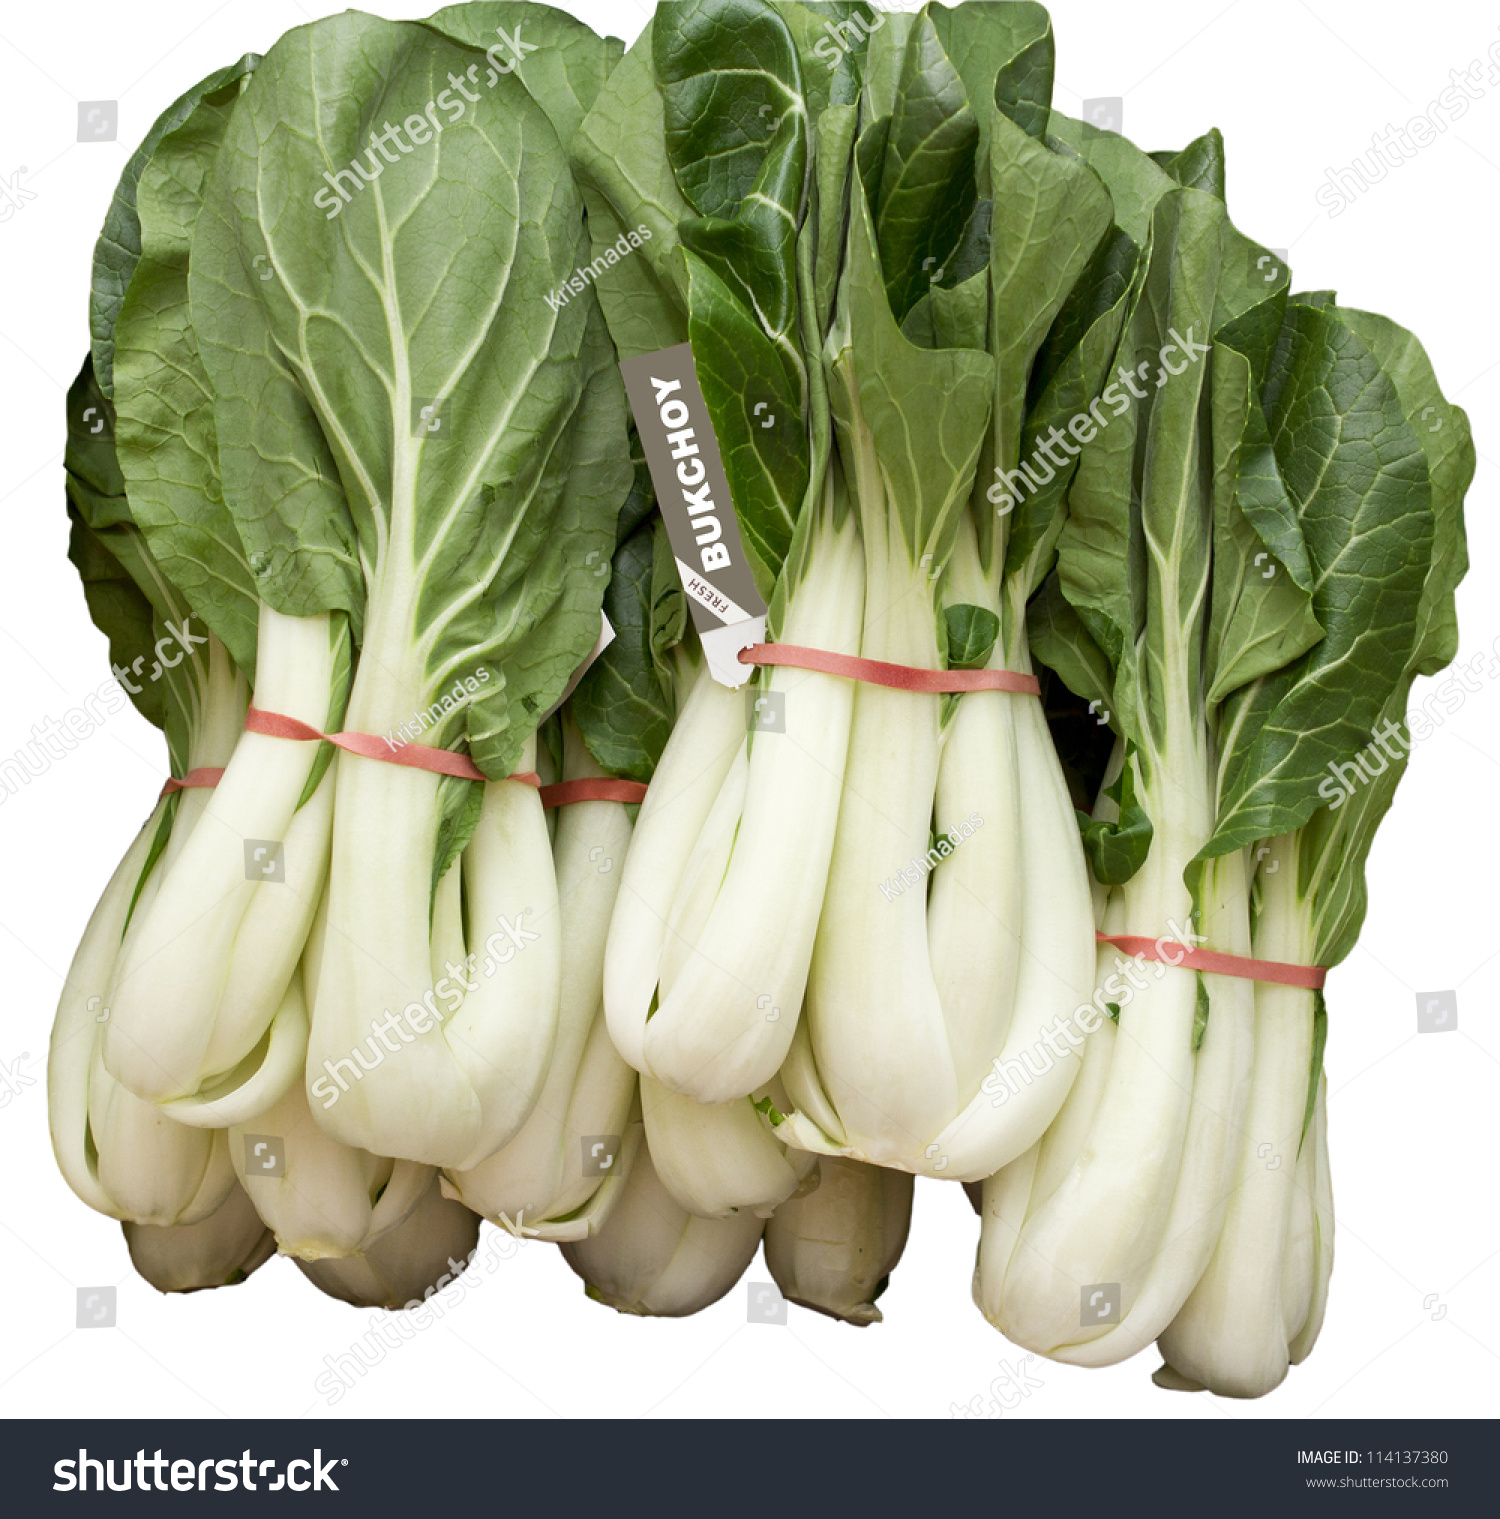 Bukchoy Vegetable Chinese Leaf Vegetables Used Stock Photo ...